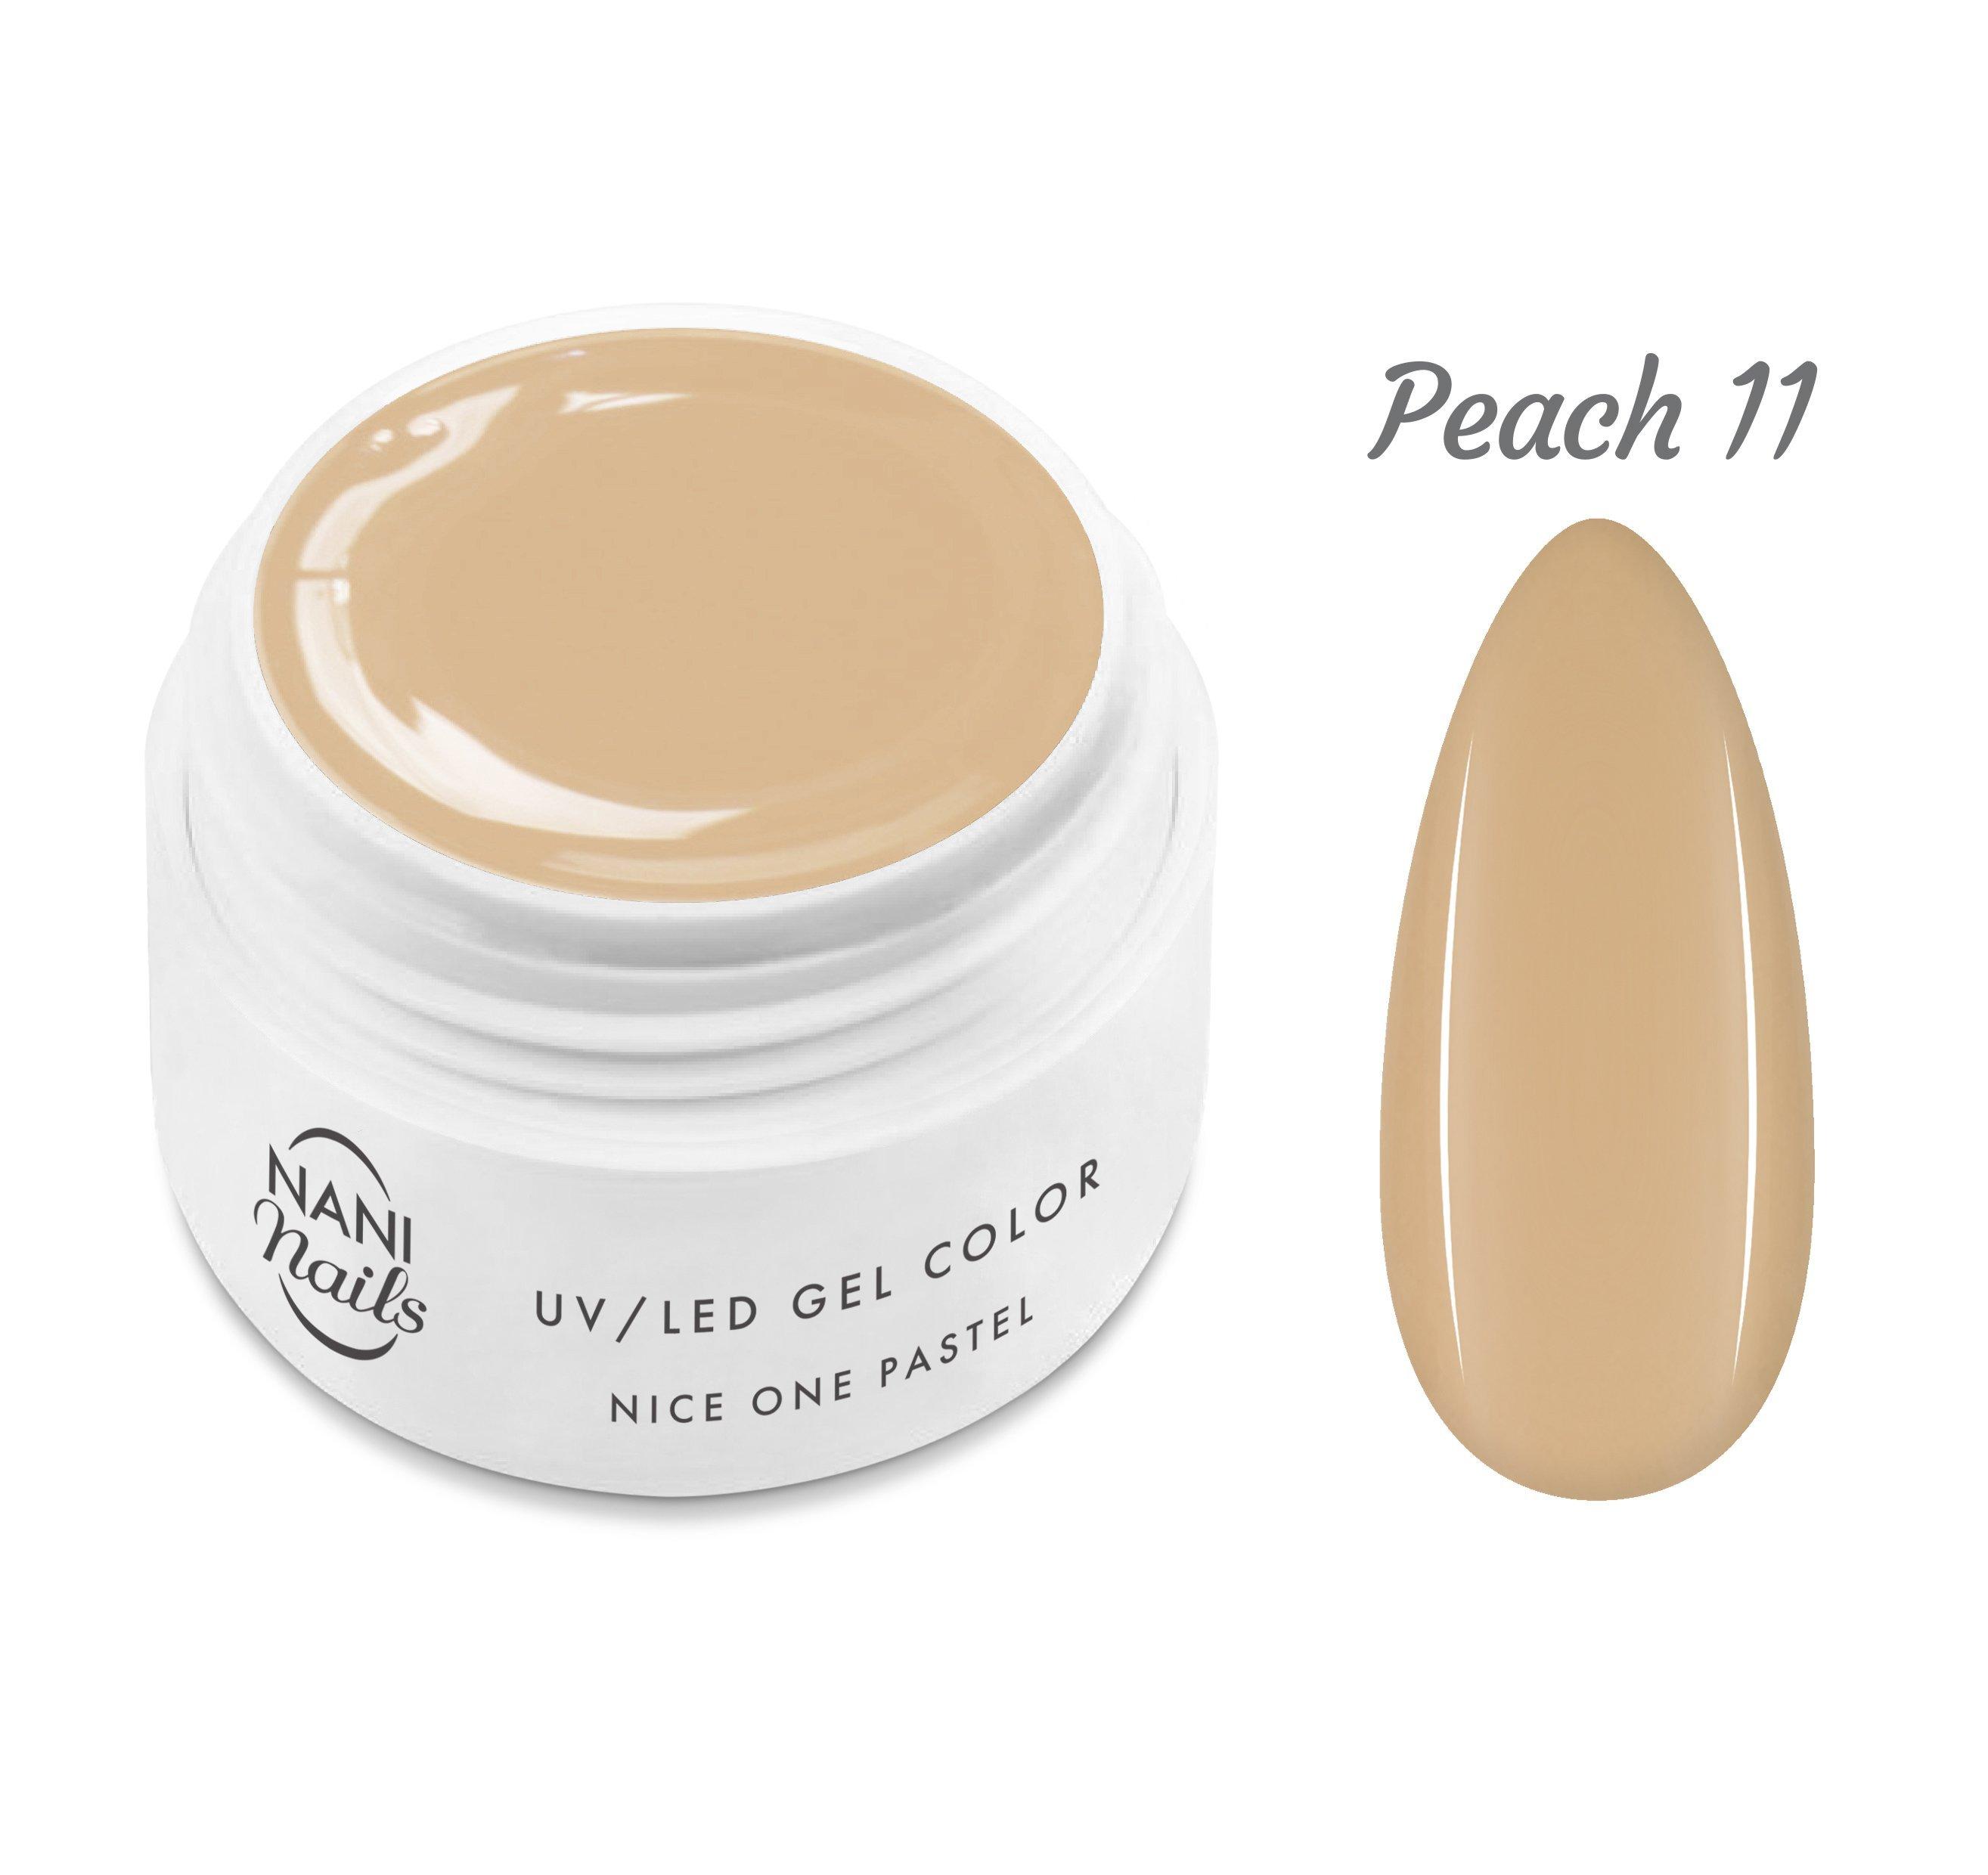 NANI UV gél Nice One Pastel 5 ml - Peach